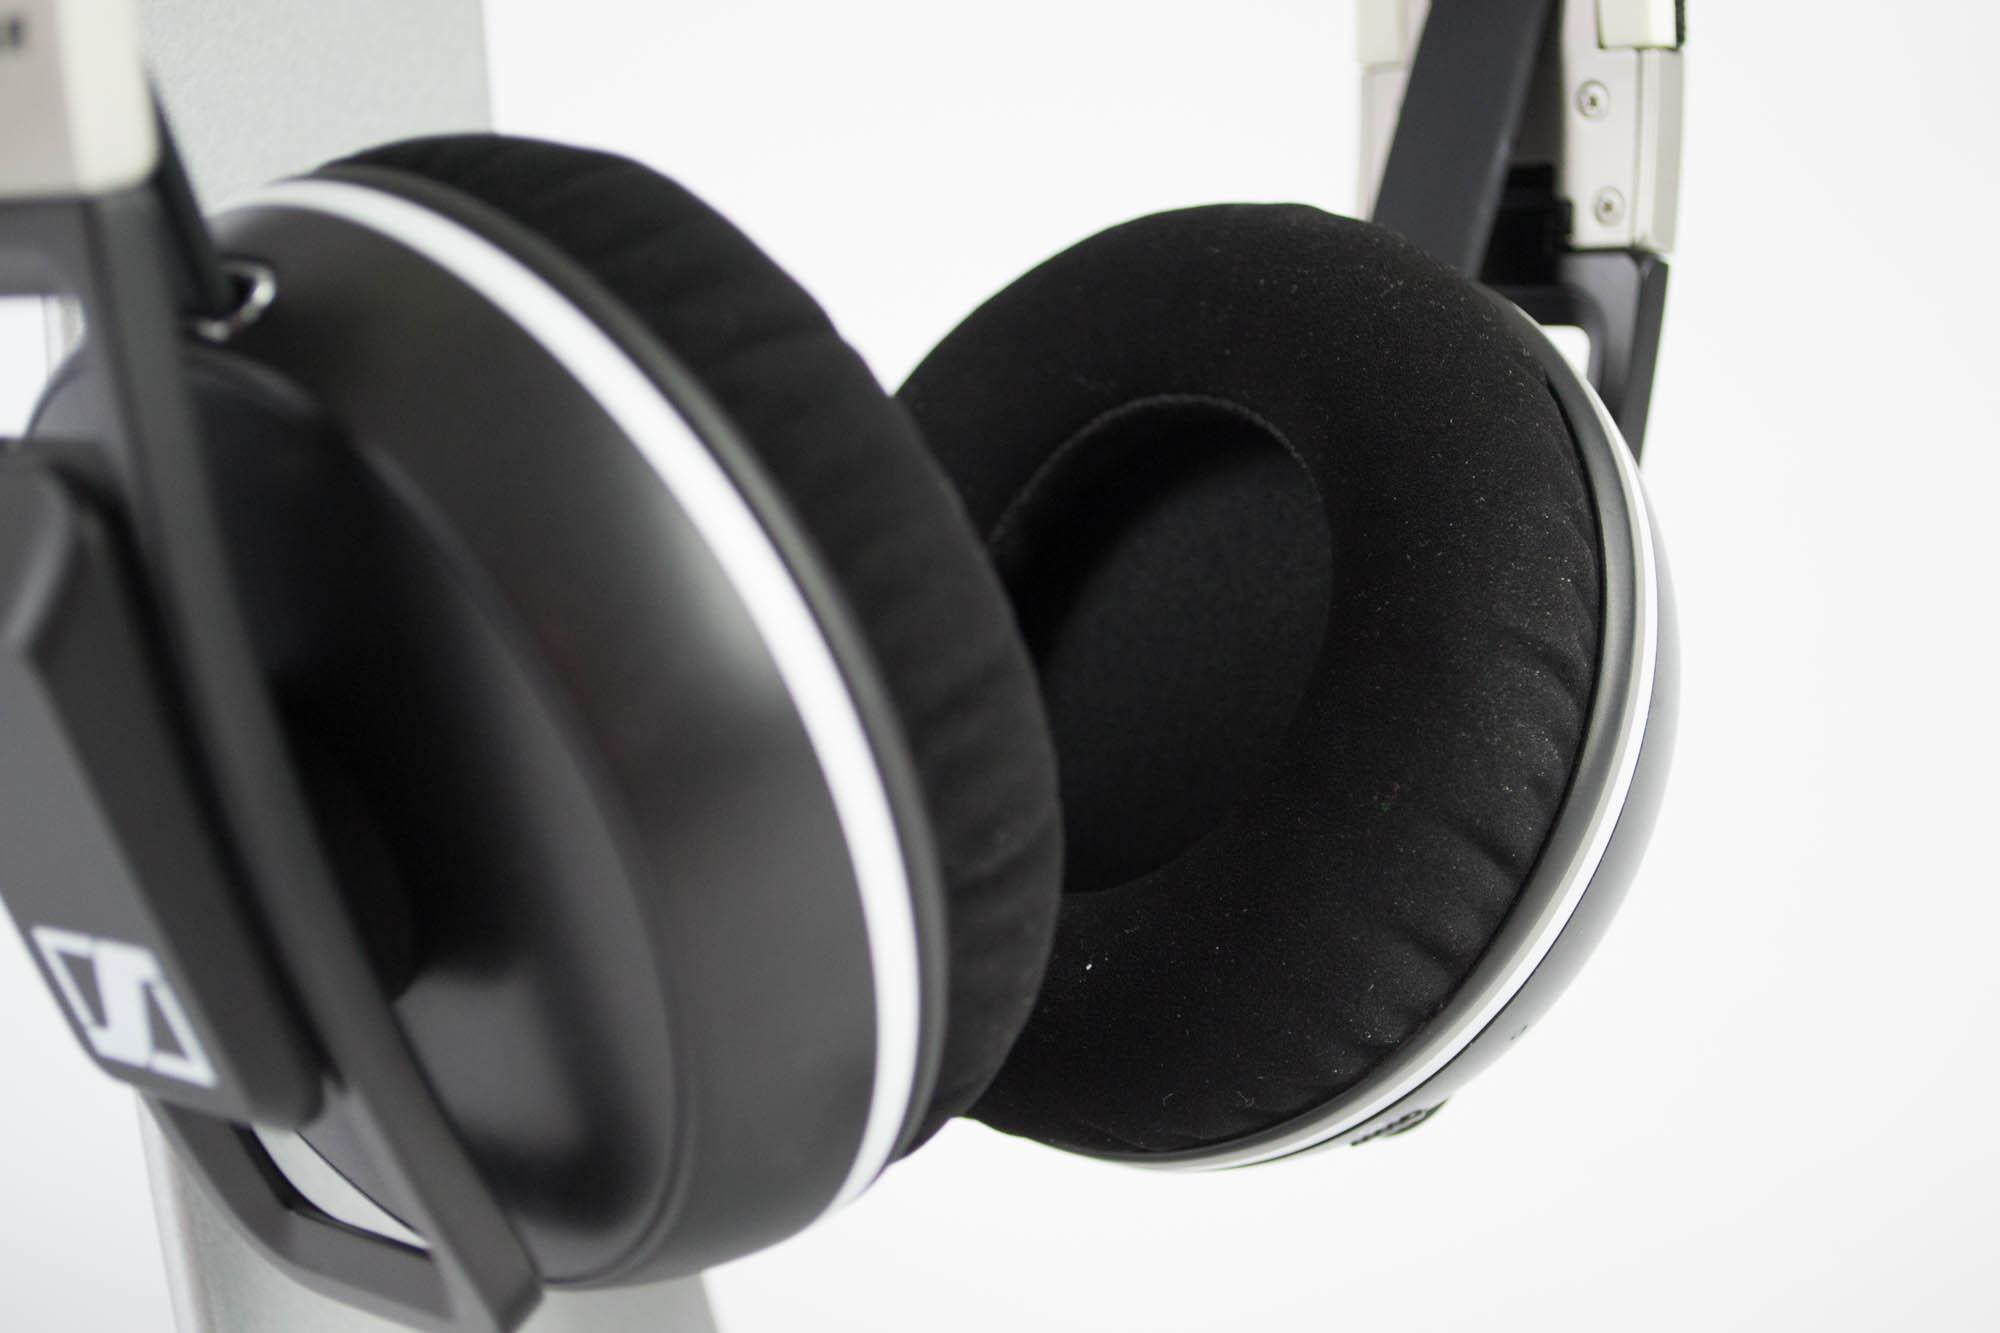 aaf94f9dc04 Sennheiser Urbanite XL Wireless Review